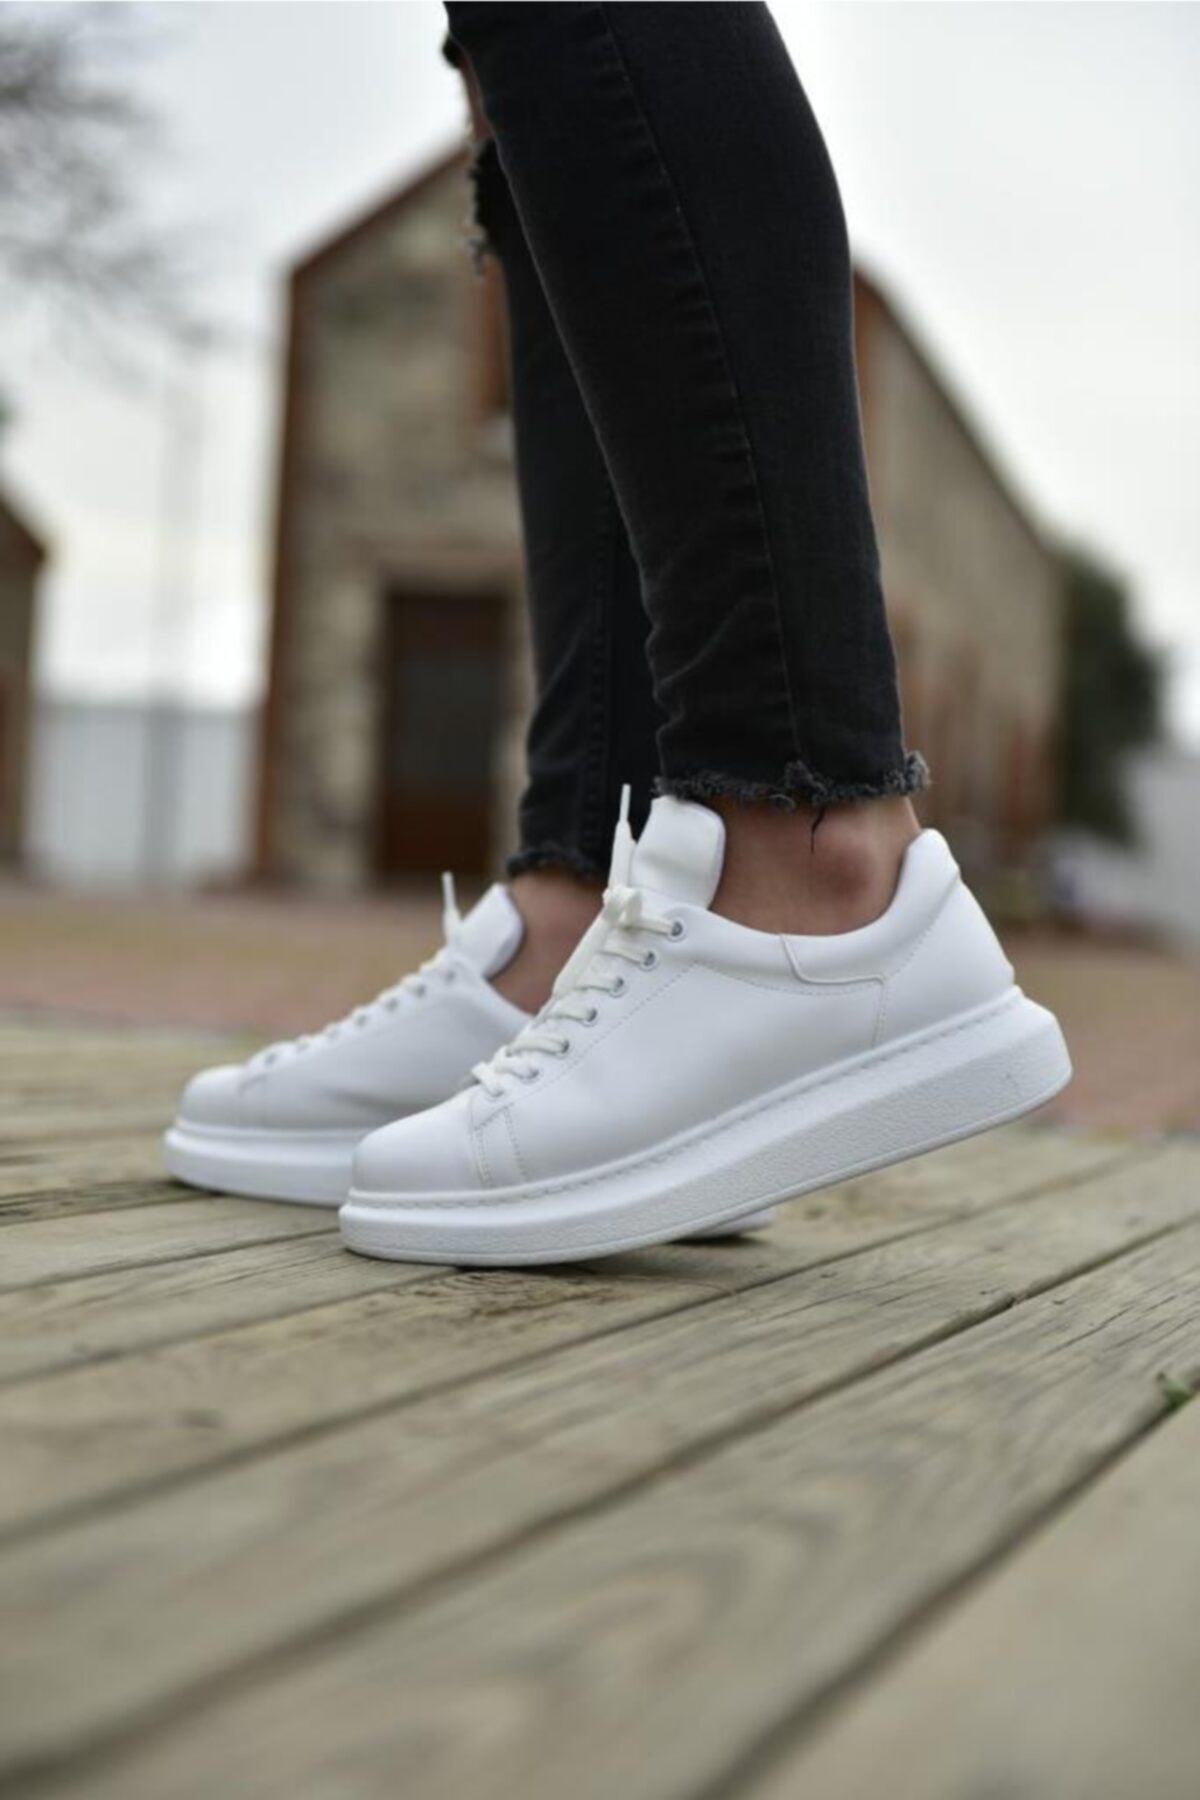 Chekich Ch Ch257 Bt Erkek Ayakkabı Beyaz 1